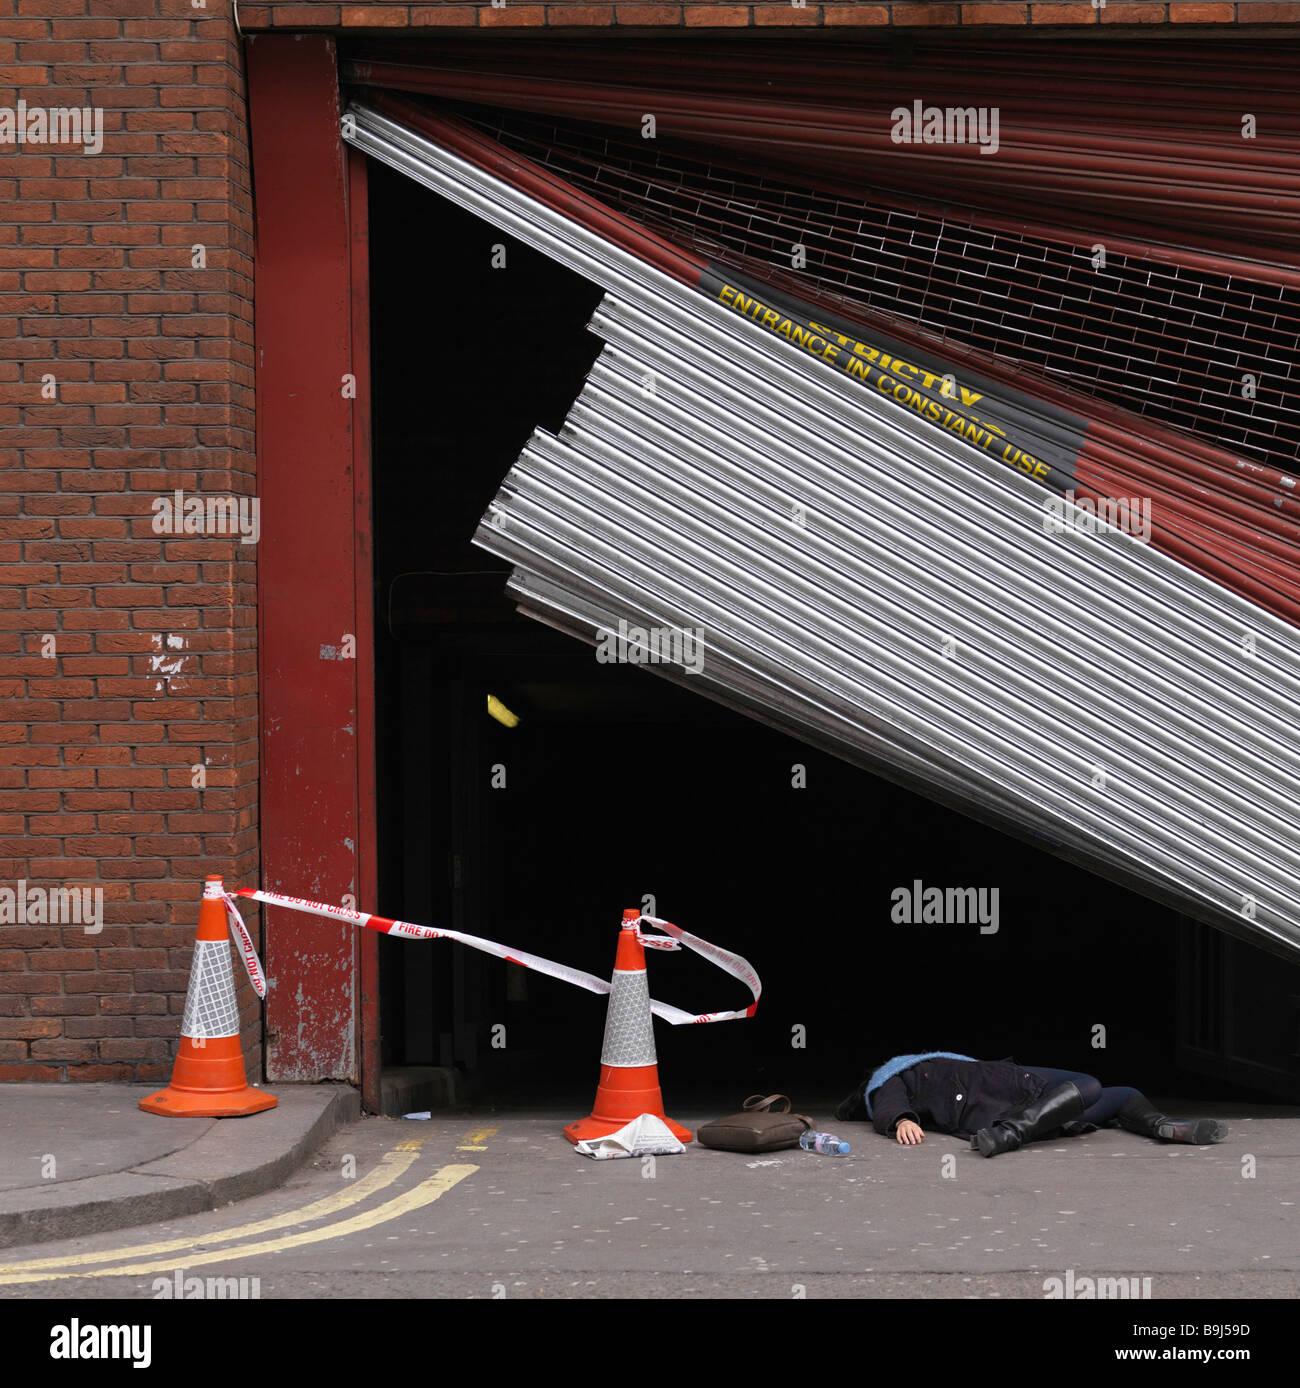 Woman lying underneath broken shutter - Stock Image